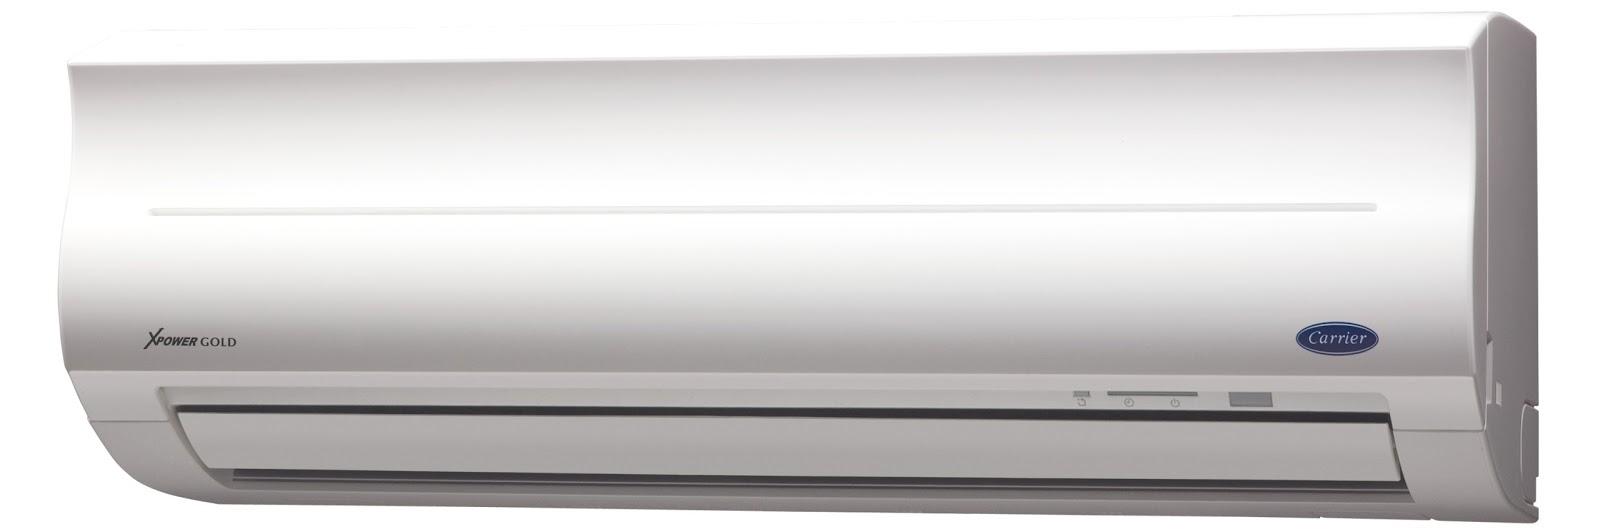 Array - air conditioning  carrier air conditioning xpower  rh   airconditioningmeshinchi blogspot com